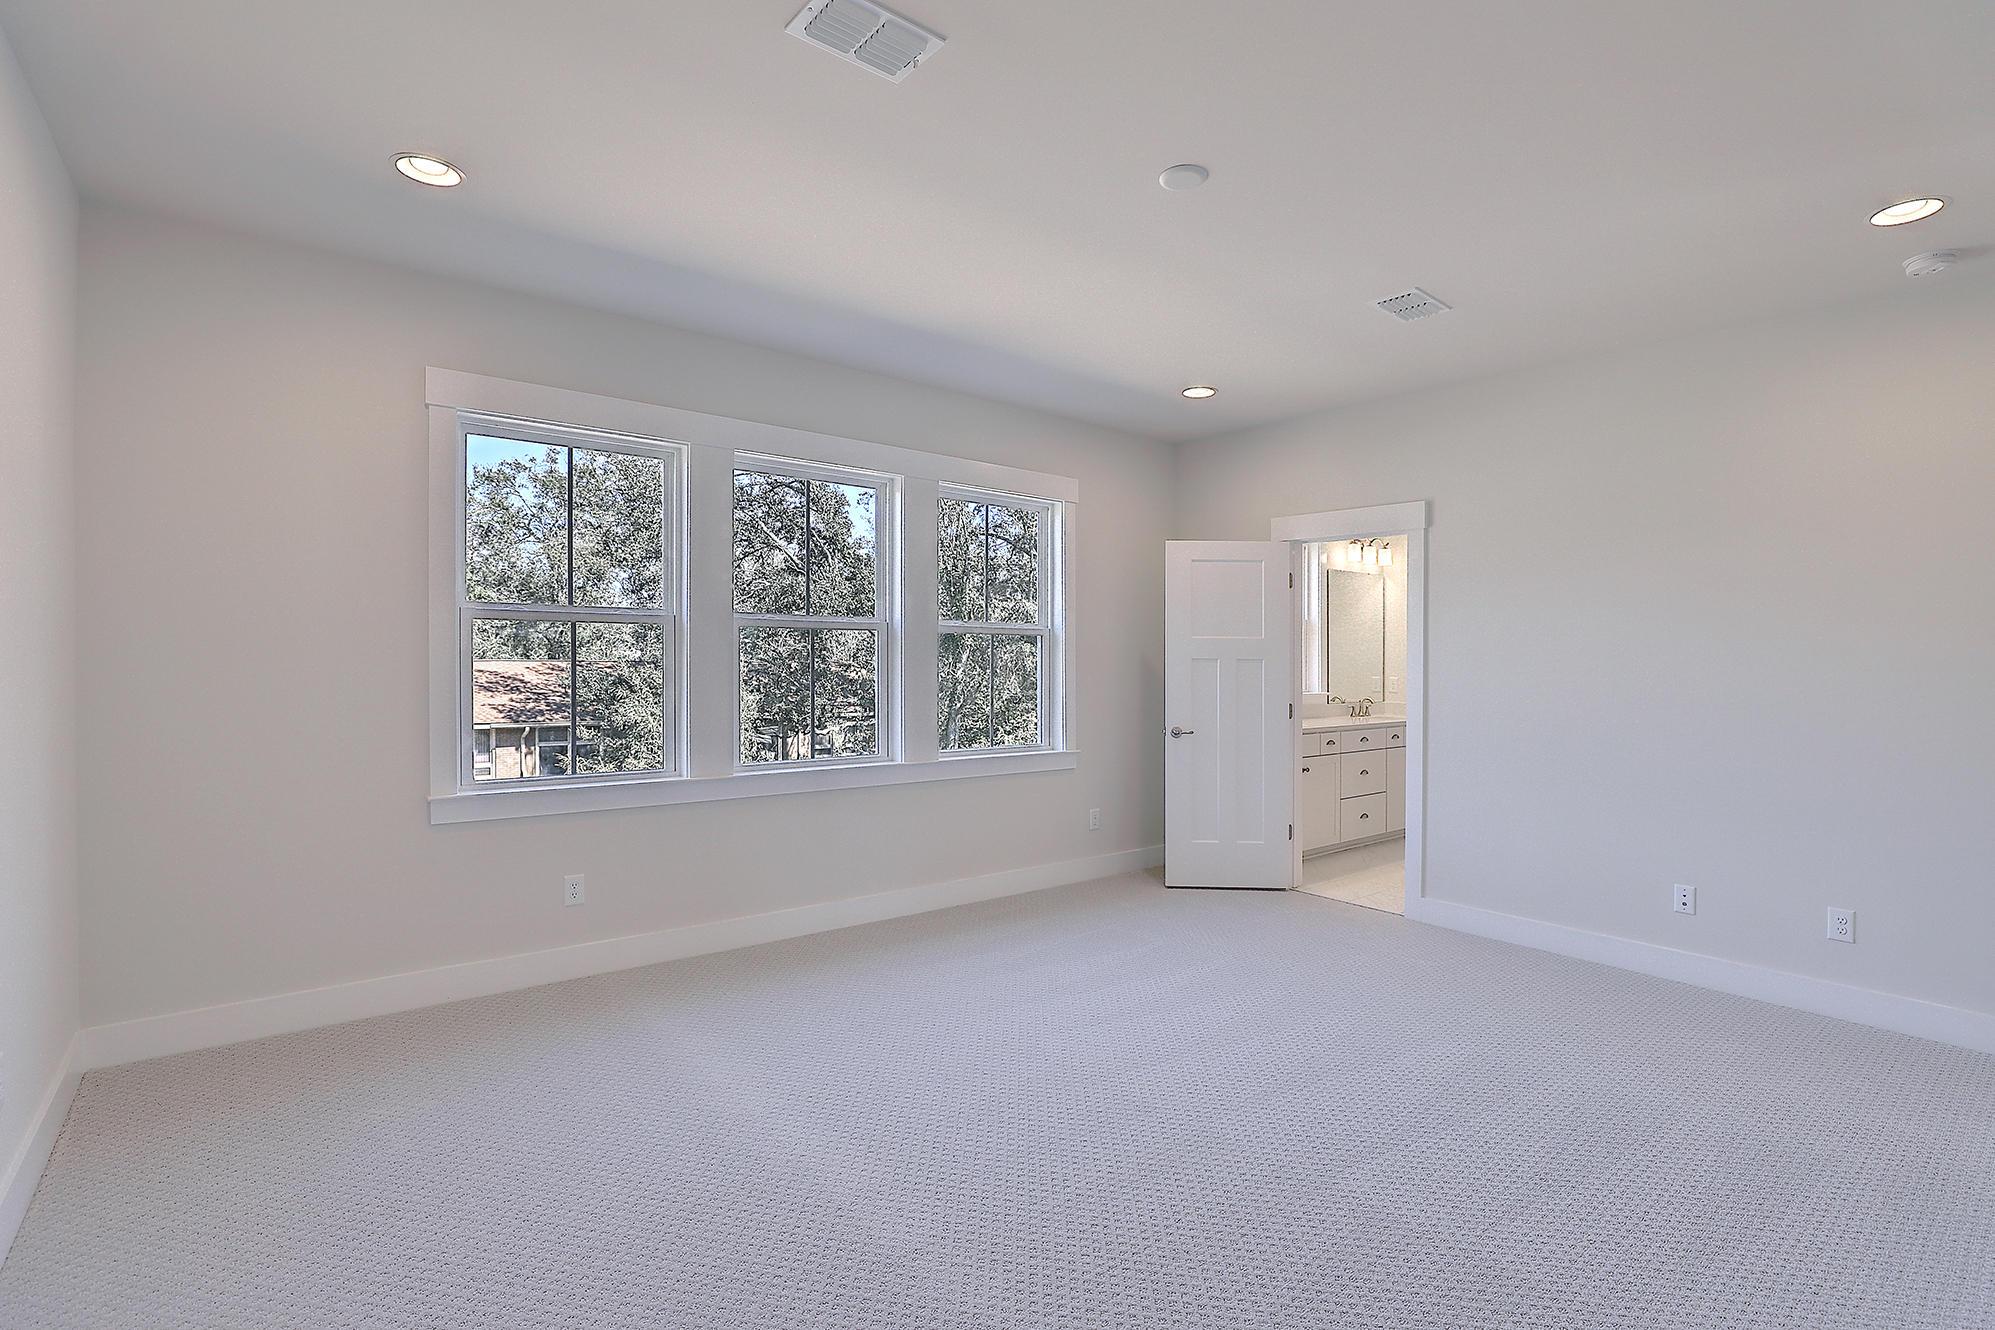 Bentley Park Homes For Sale - 1218 Gannett, Mount Pleasant, SC - 33